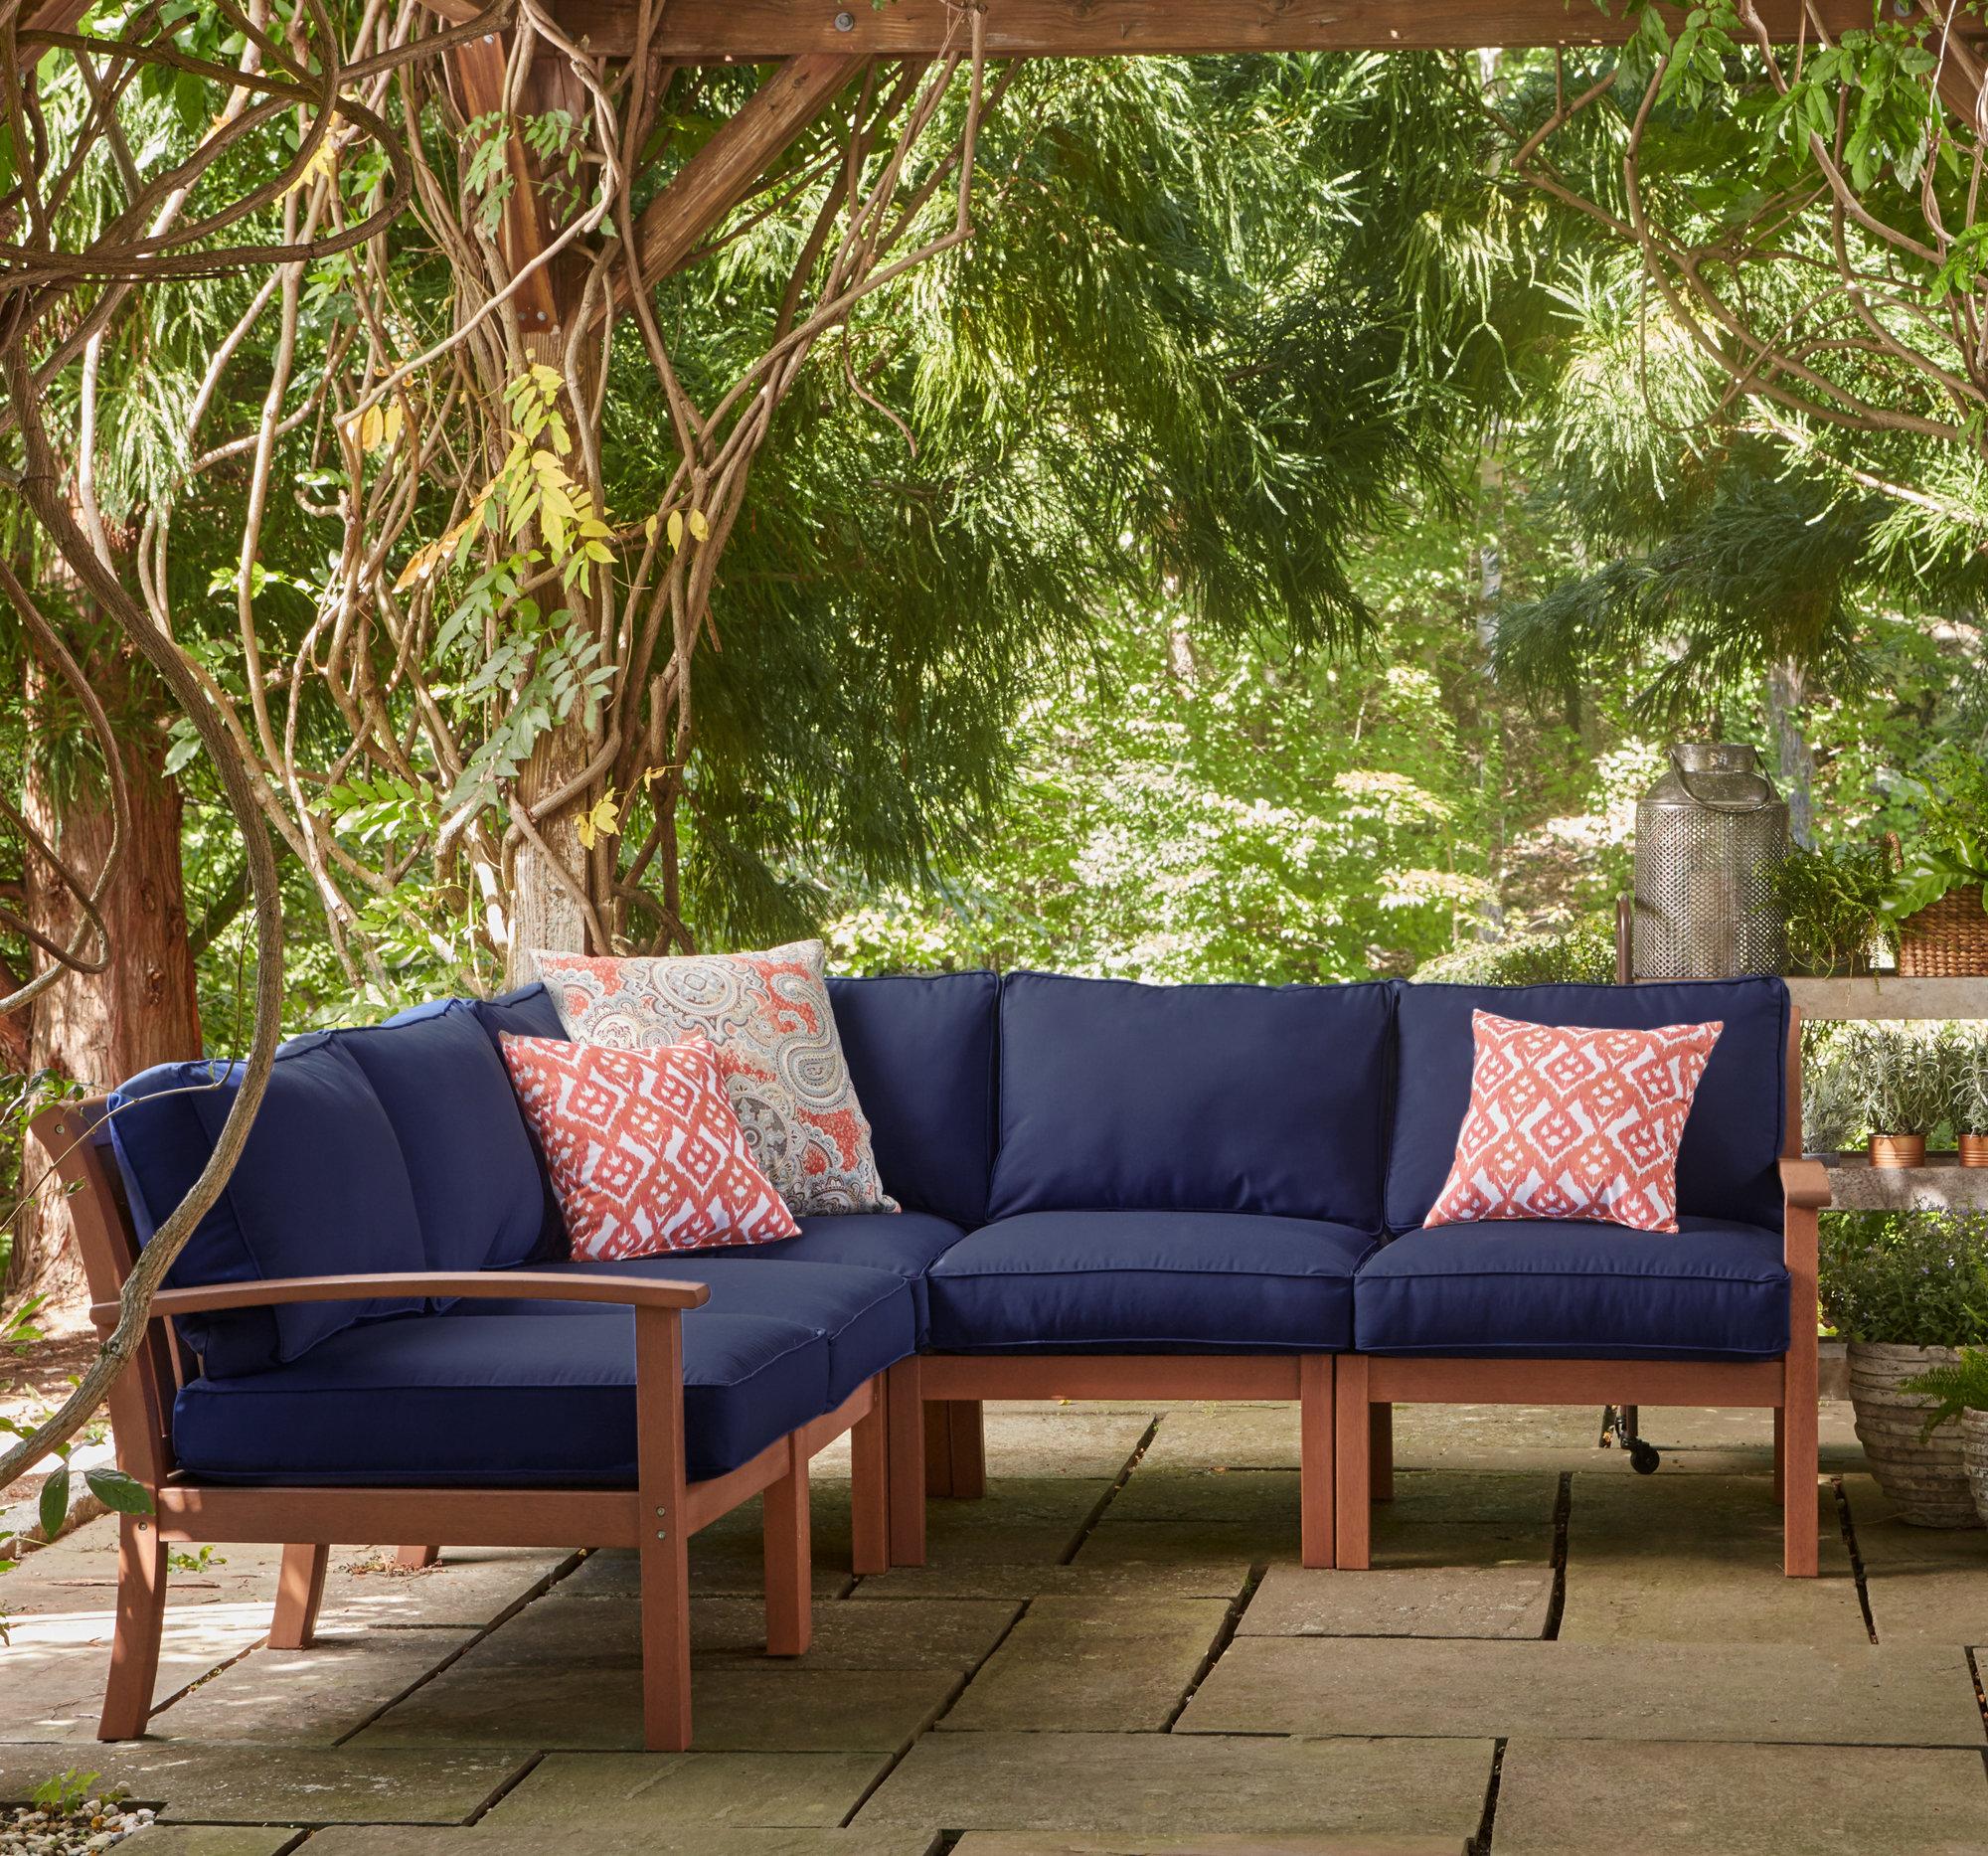 birch lane™ rossi patio sectional with cushions | birch lane PTSPTGH